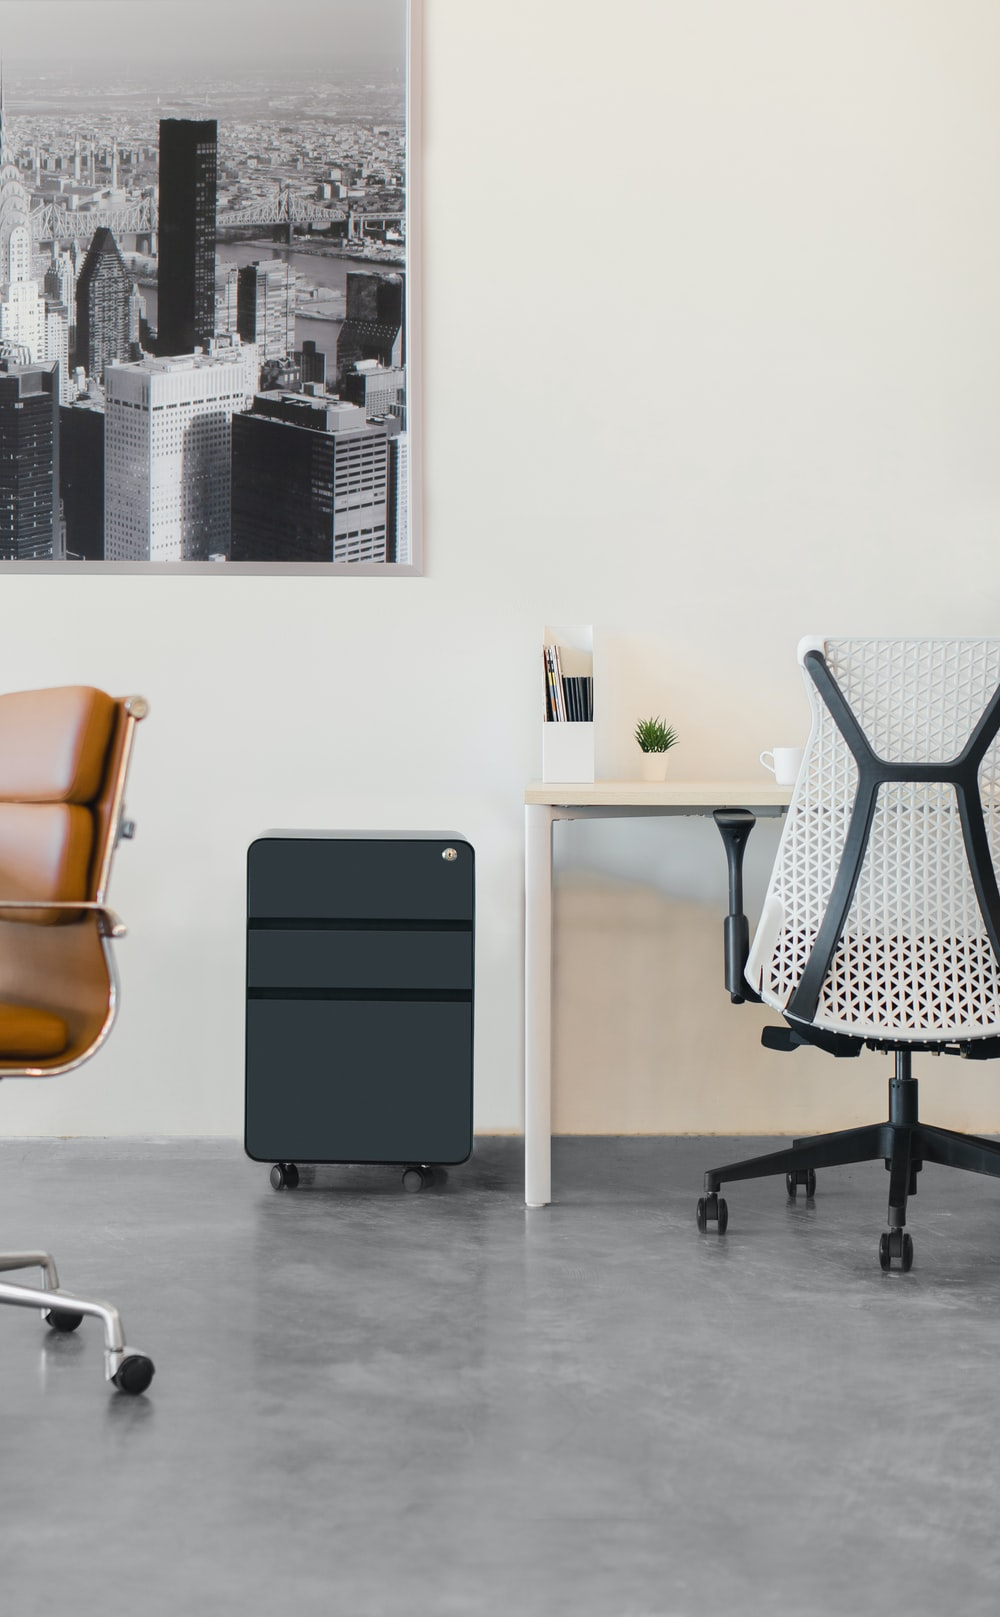 black and white polka dot chair